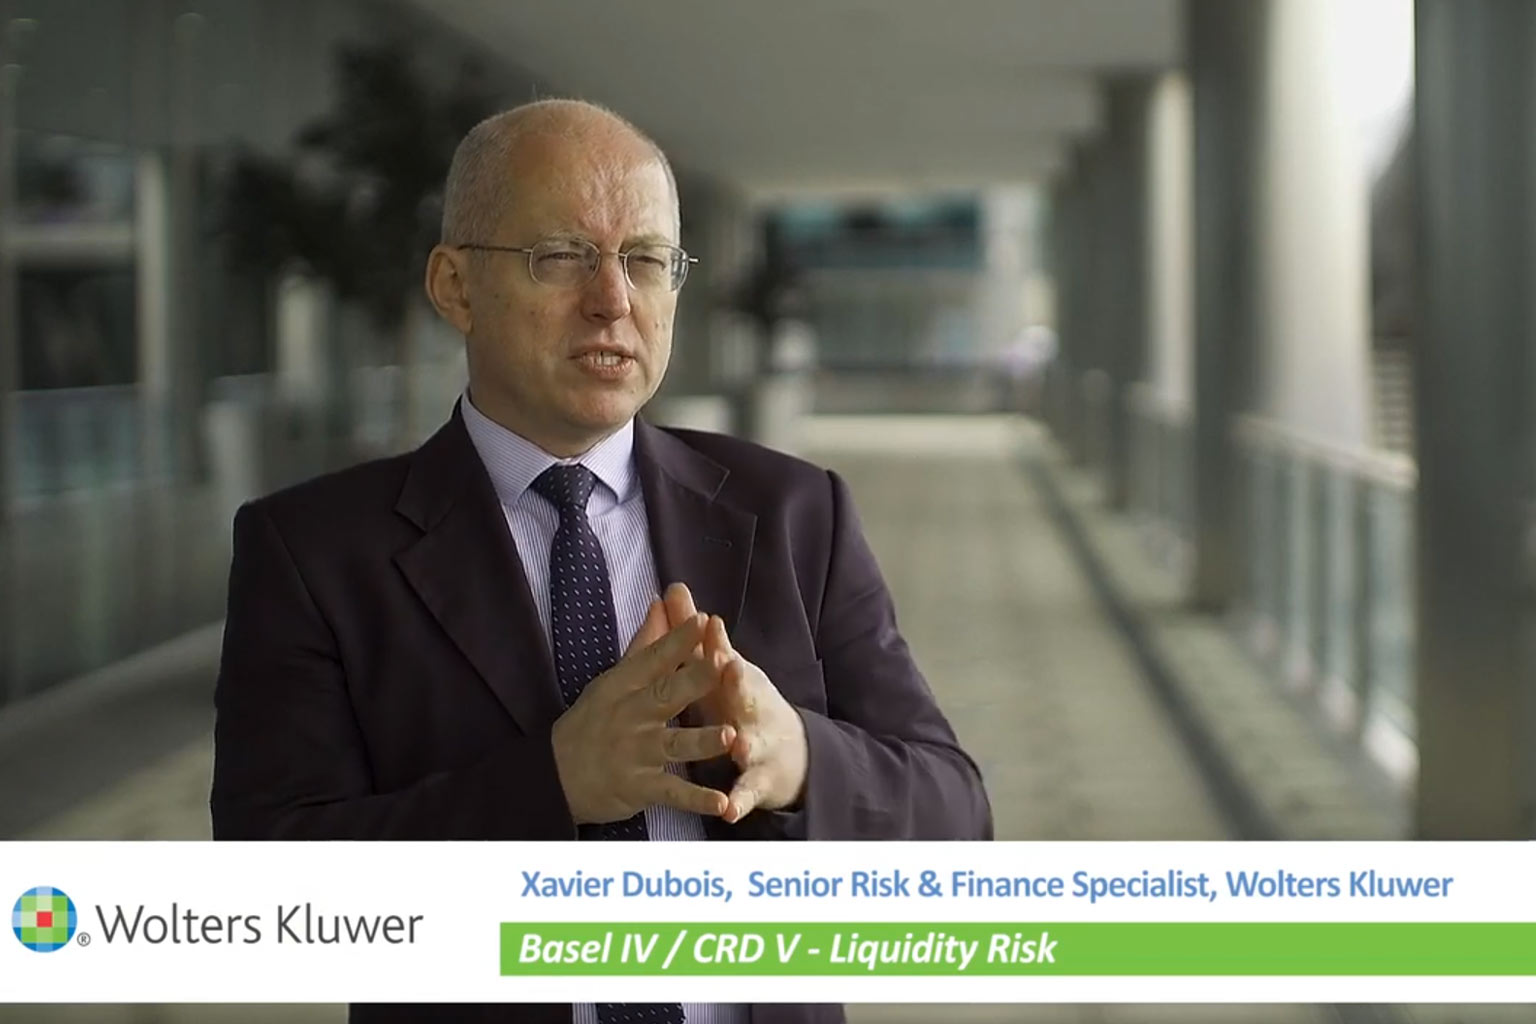 Bsel IV Liquidity Risk Video